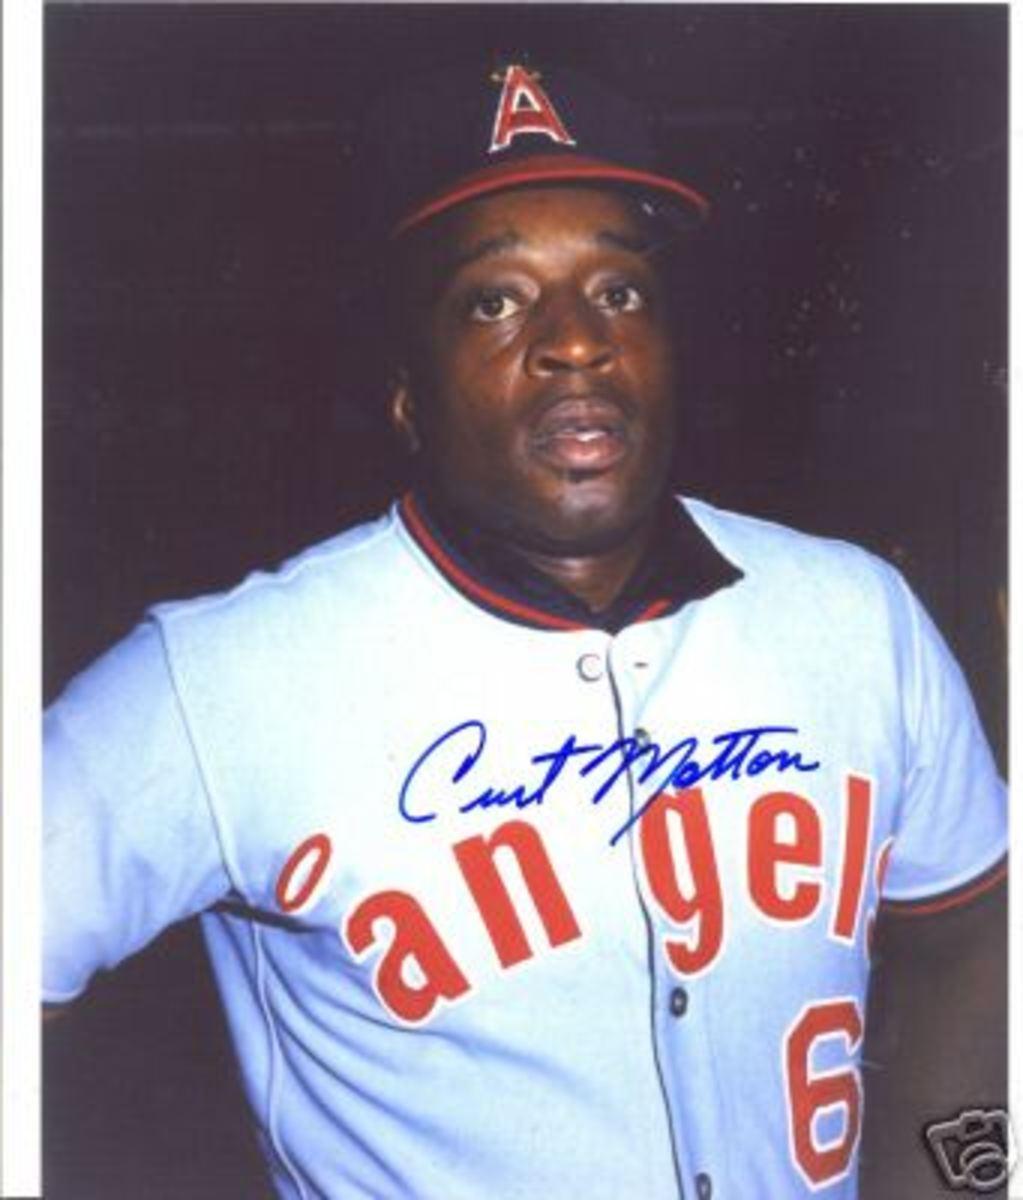 Curtell Howard Motton (September 24, 1940  January 21, 2010) - cancer deaths